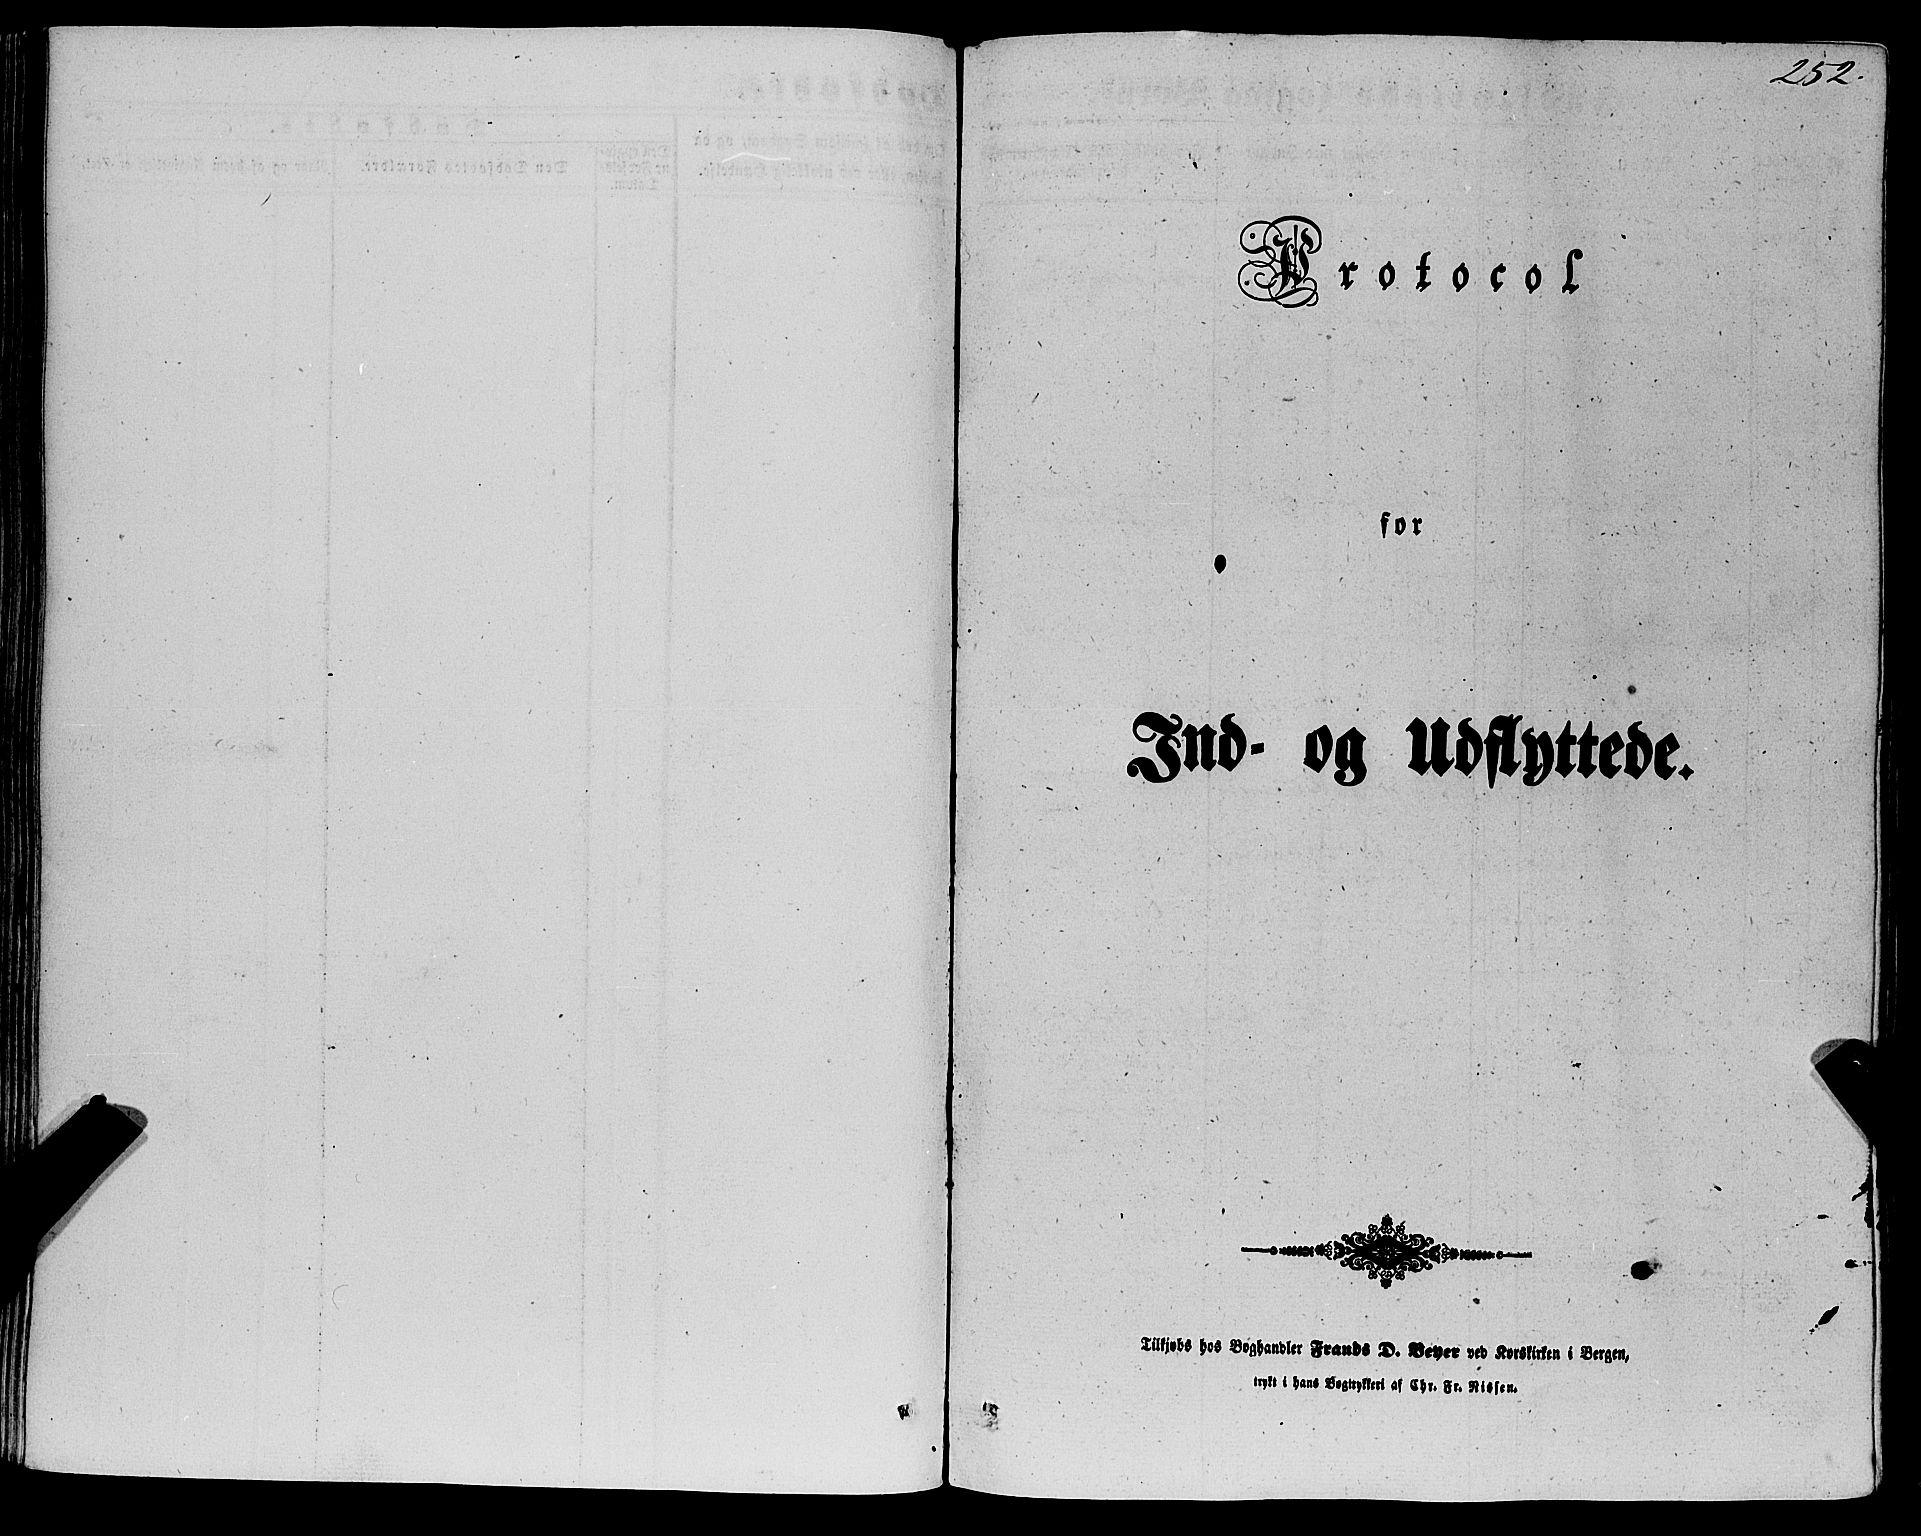 SAB, Fana Sokneprestembete, H/Haa/Haaa/L0011: Ministerialbok nr. A 11, 1851-1862, s. 252